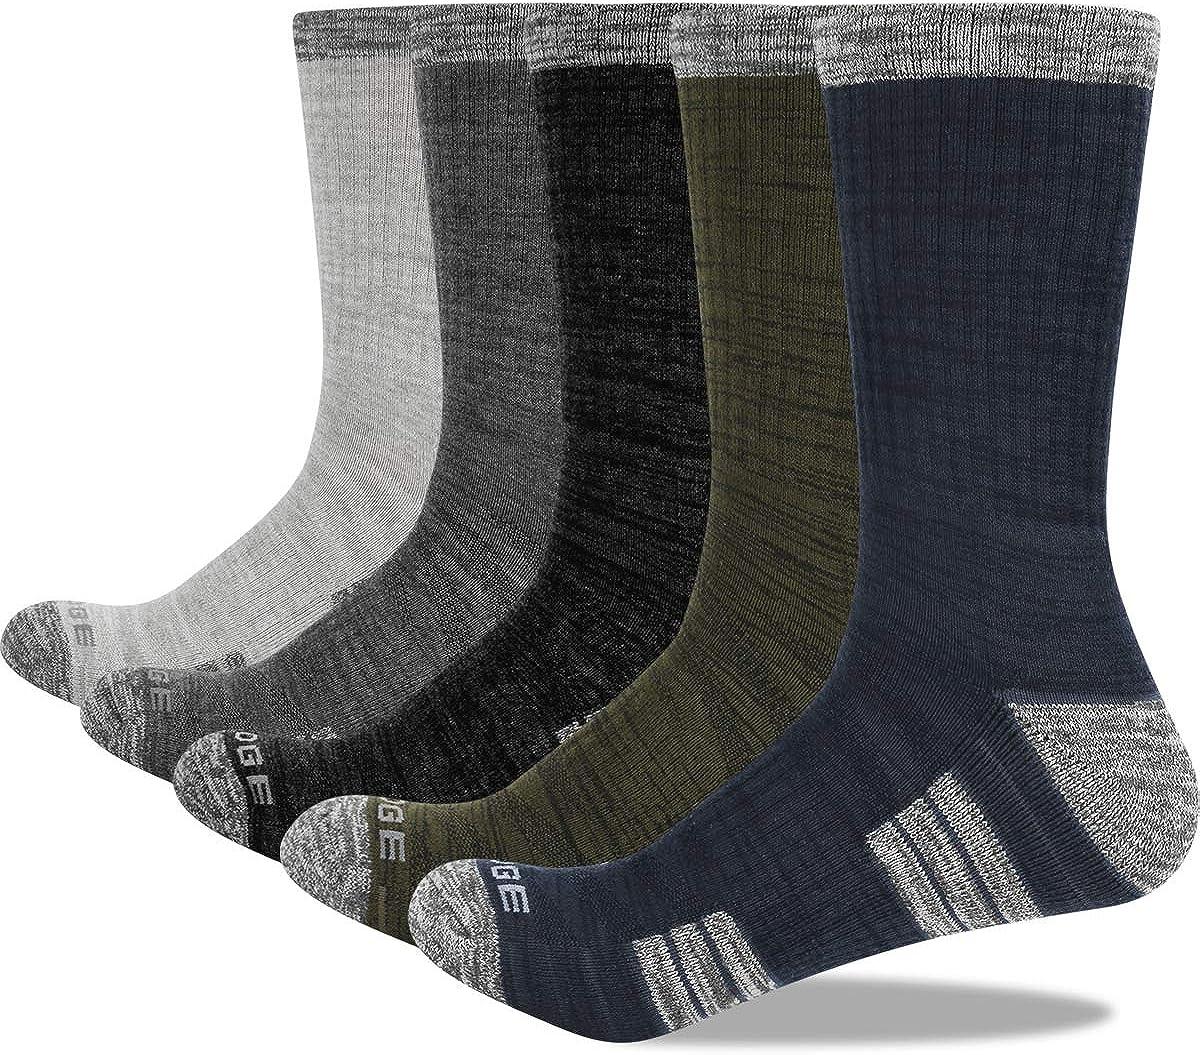 YUEDGE Men's Moisture Wick Cushion Hiking Socks Comfort Crew Boot Socks For Men Size 7-13, 5 Pairs/Pack